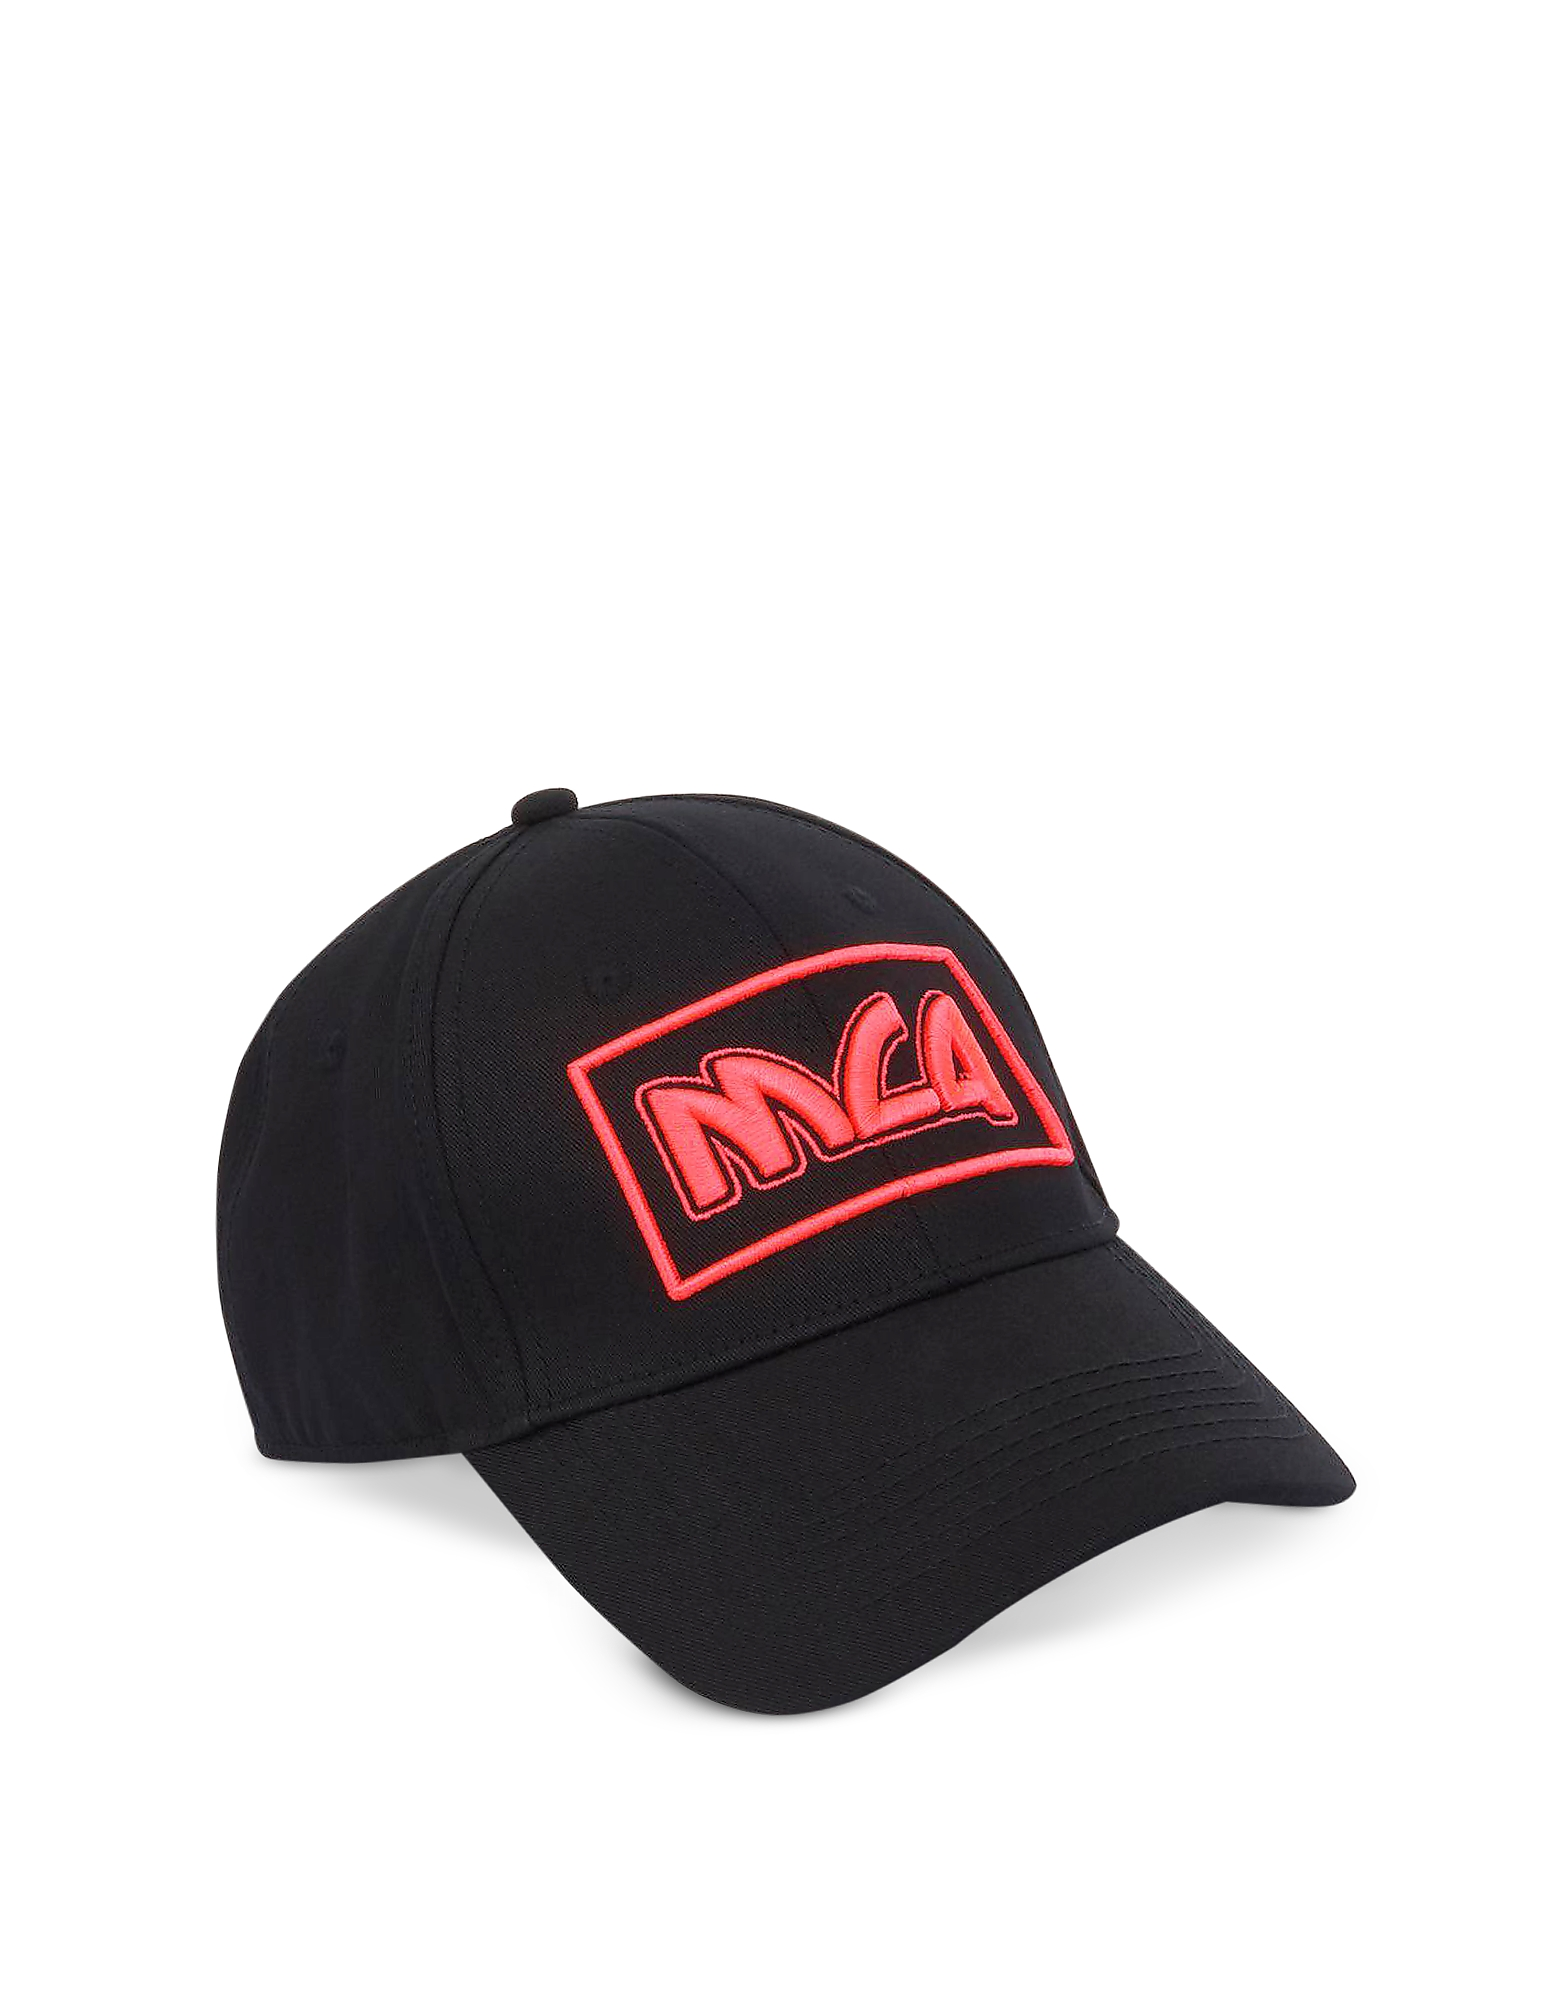 Mcq By Alexander Mcqueen Mcq Alexander Mcqueen Metal Logo Cotton Baseball  Cap In Black   Pink 5cd975868a6c